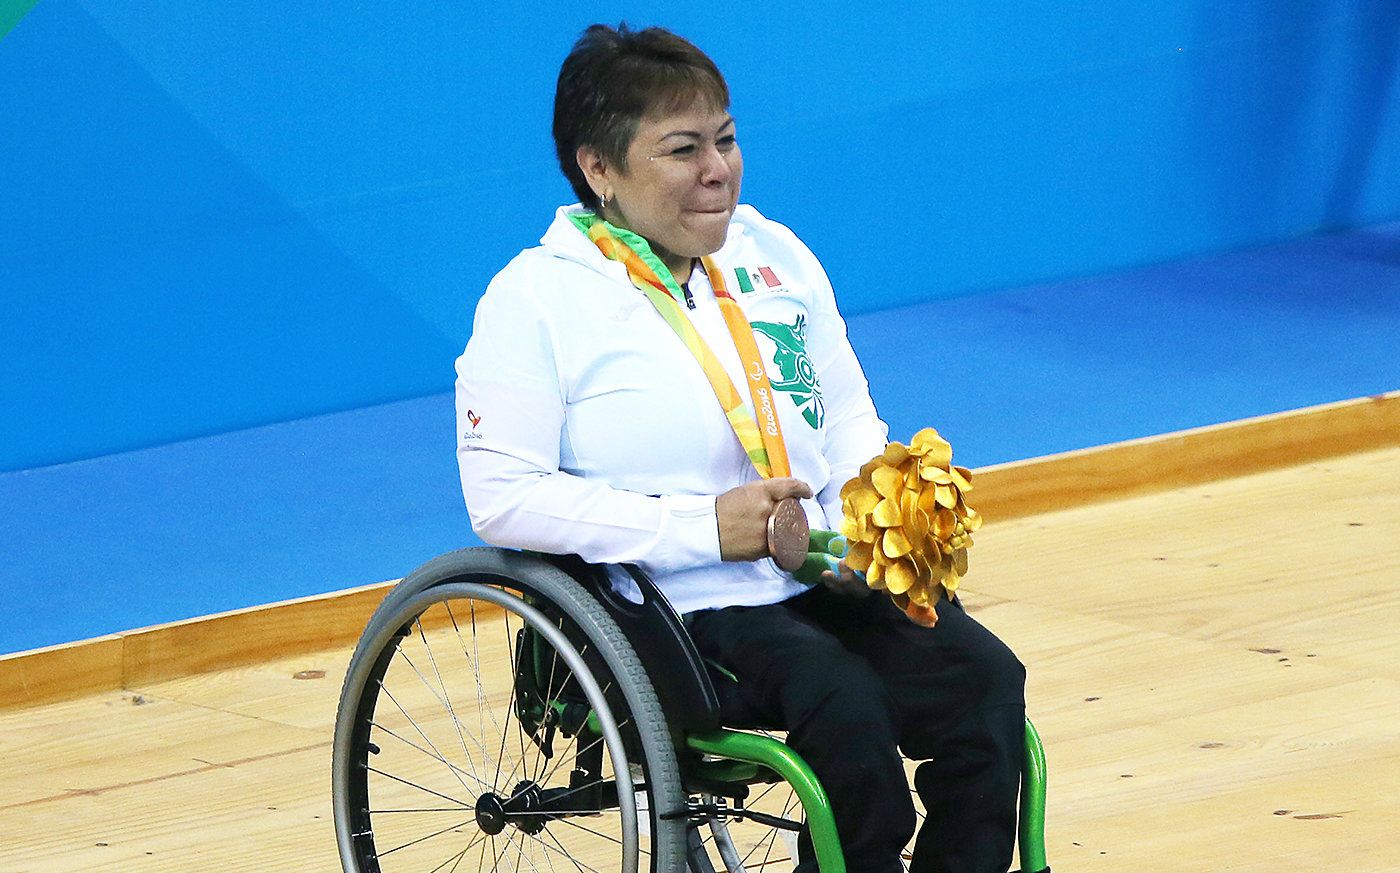 Patricia Valle